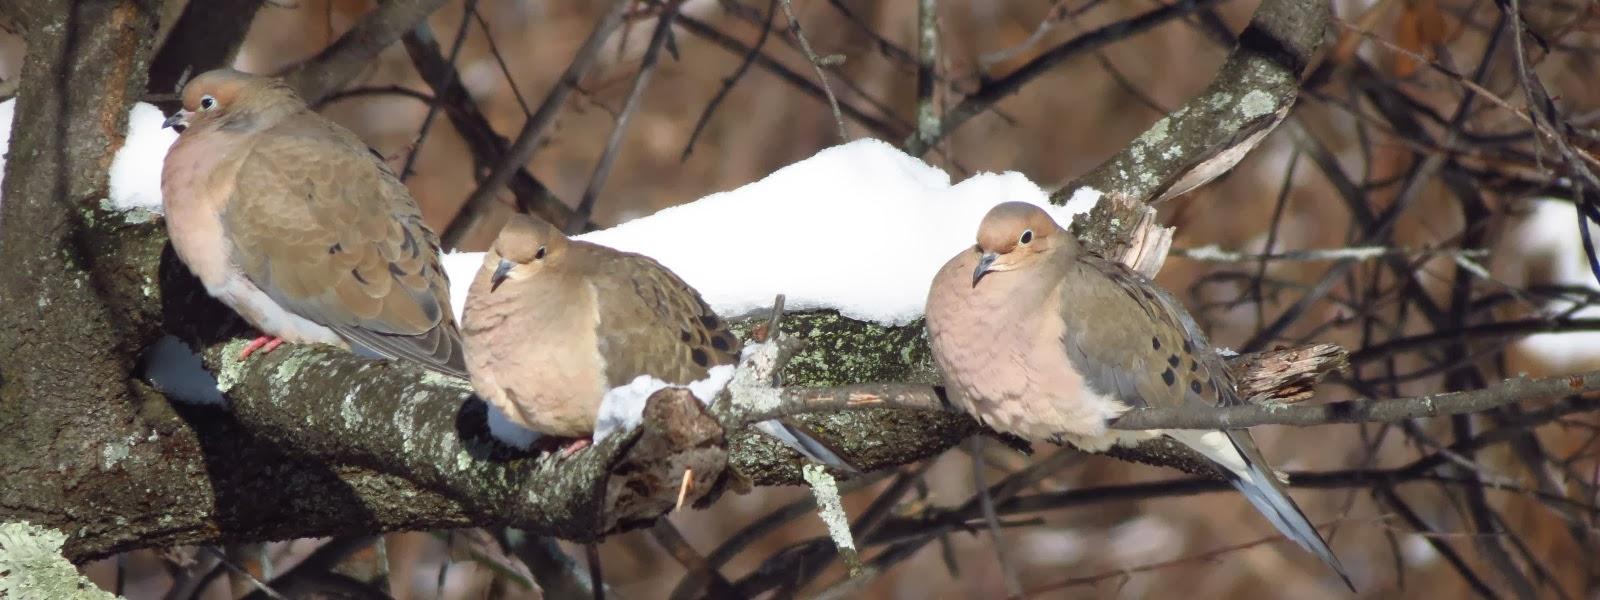 mourning doves sunning